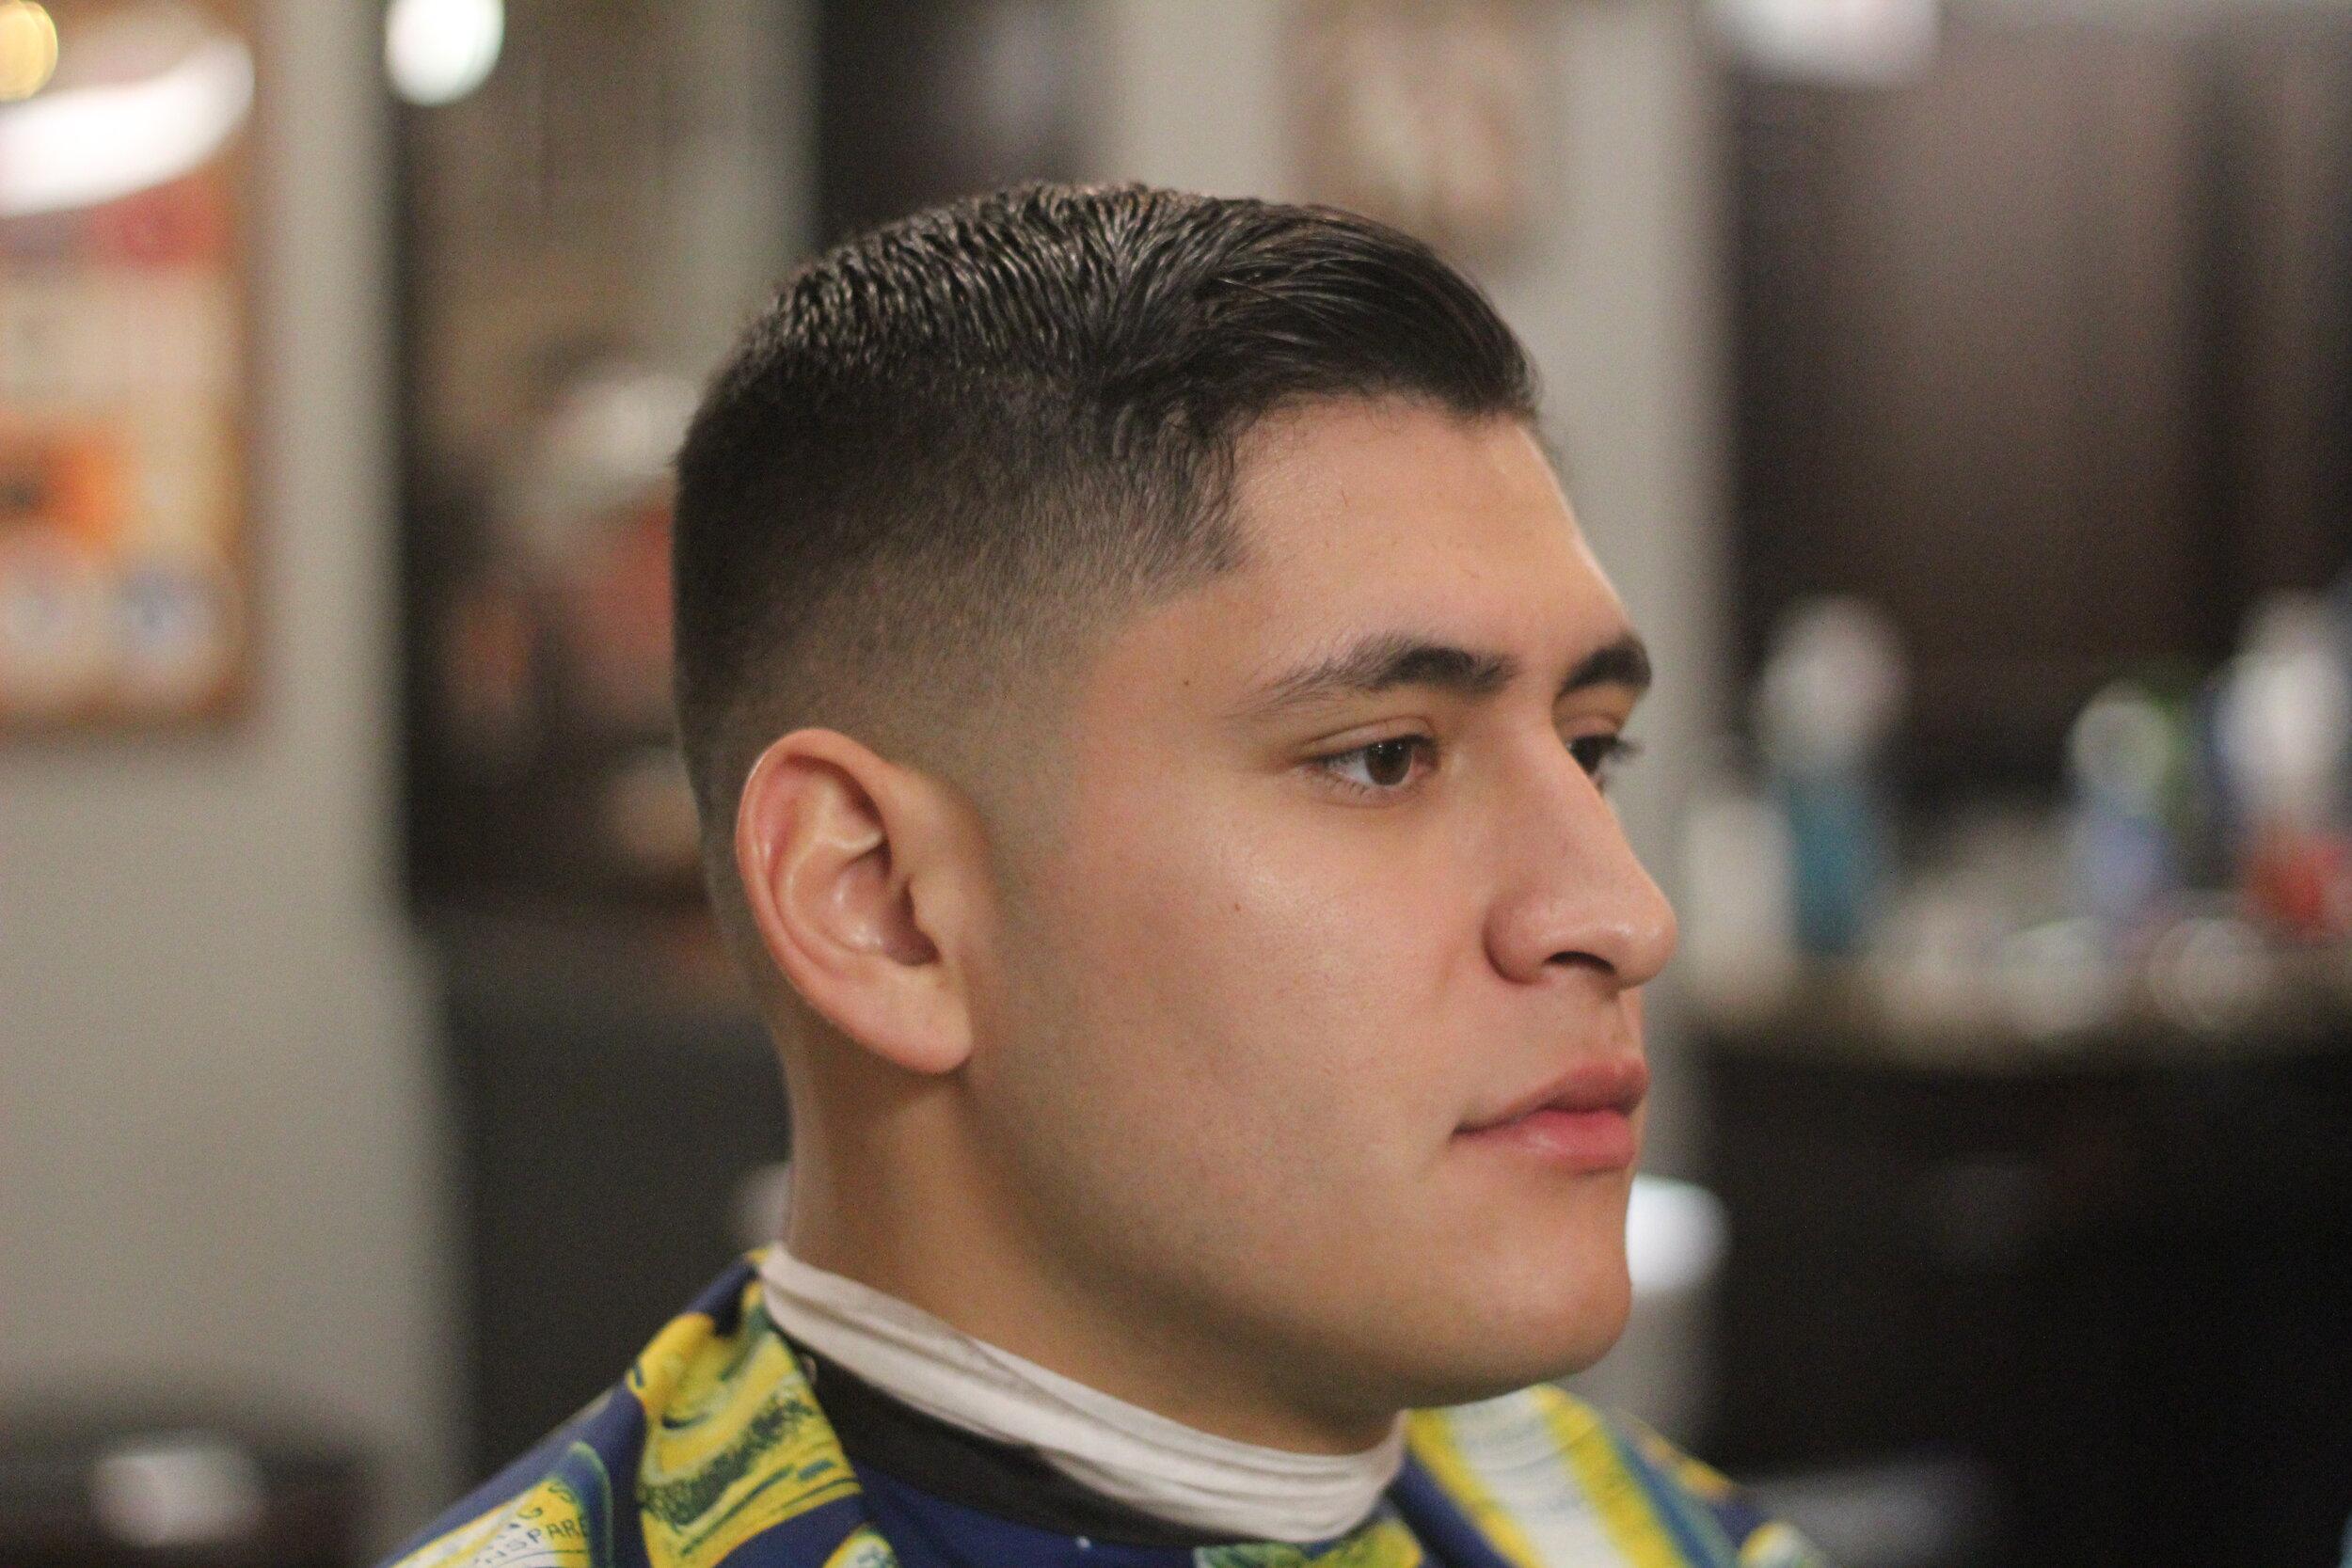 Refinery Barbershop